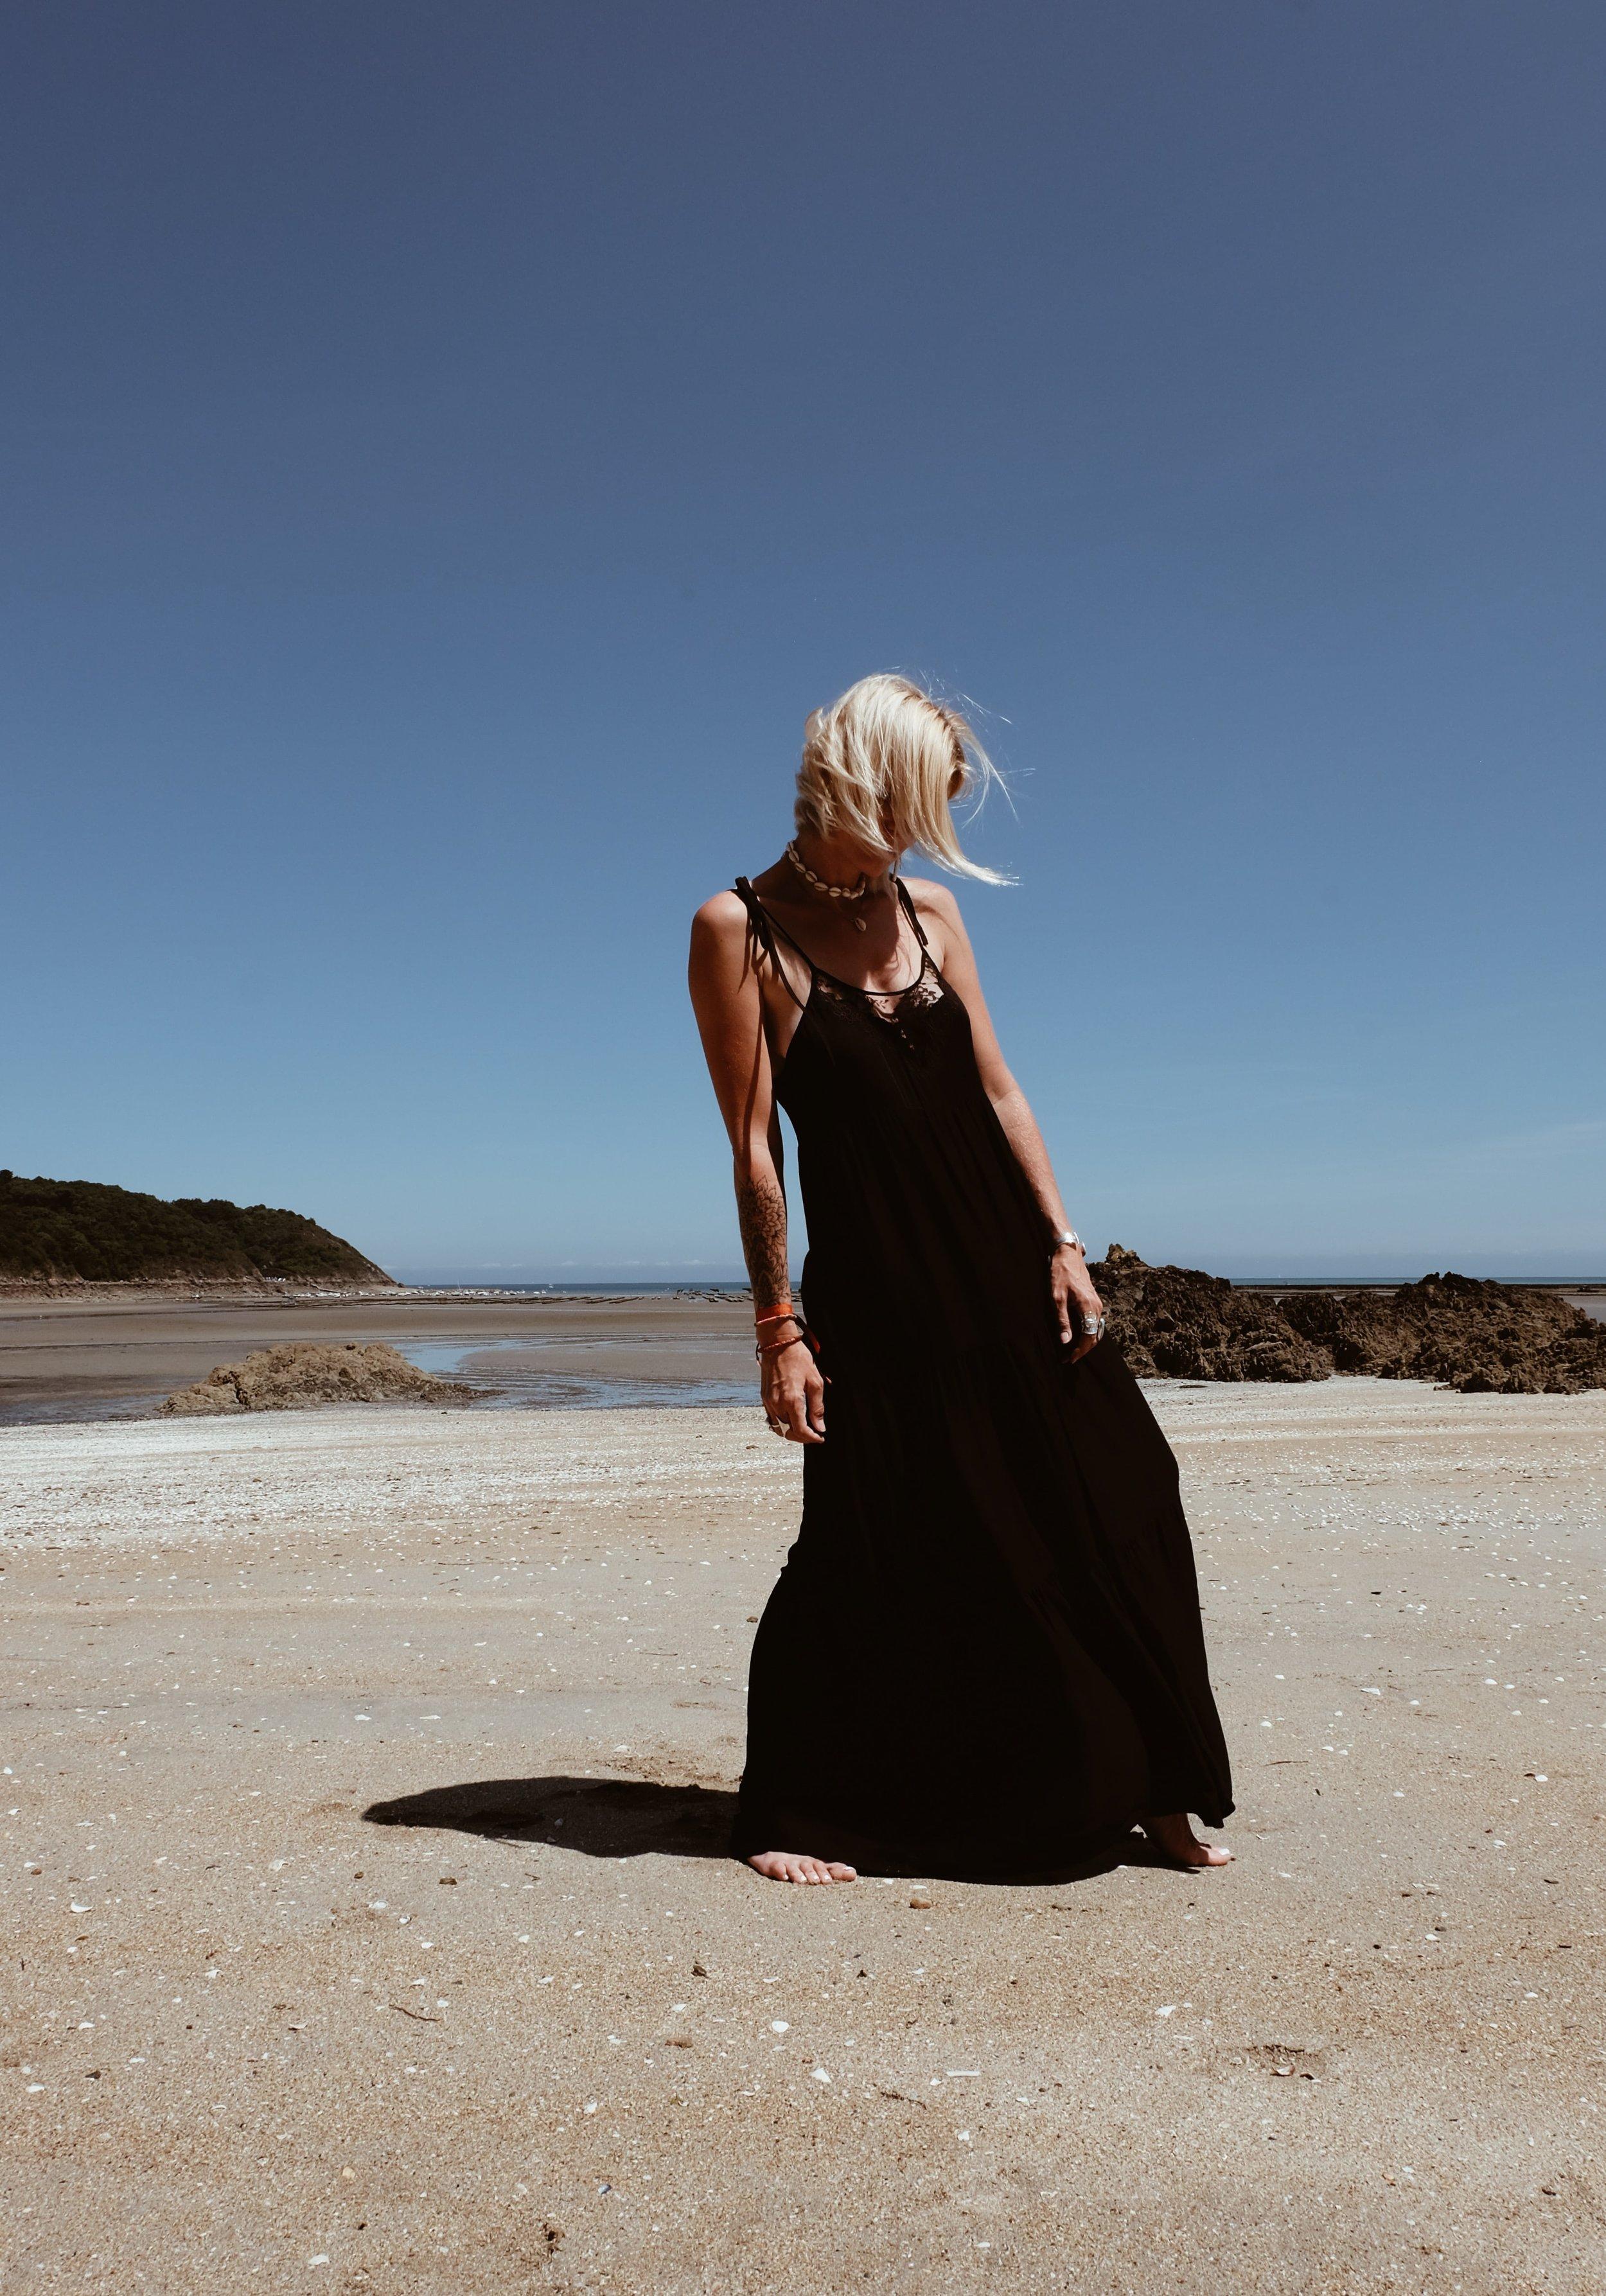 Carnet Sauvage - robe longue noire Stradivarius10-min.JPG